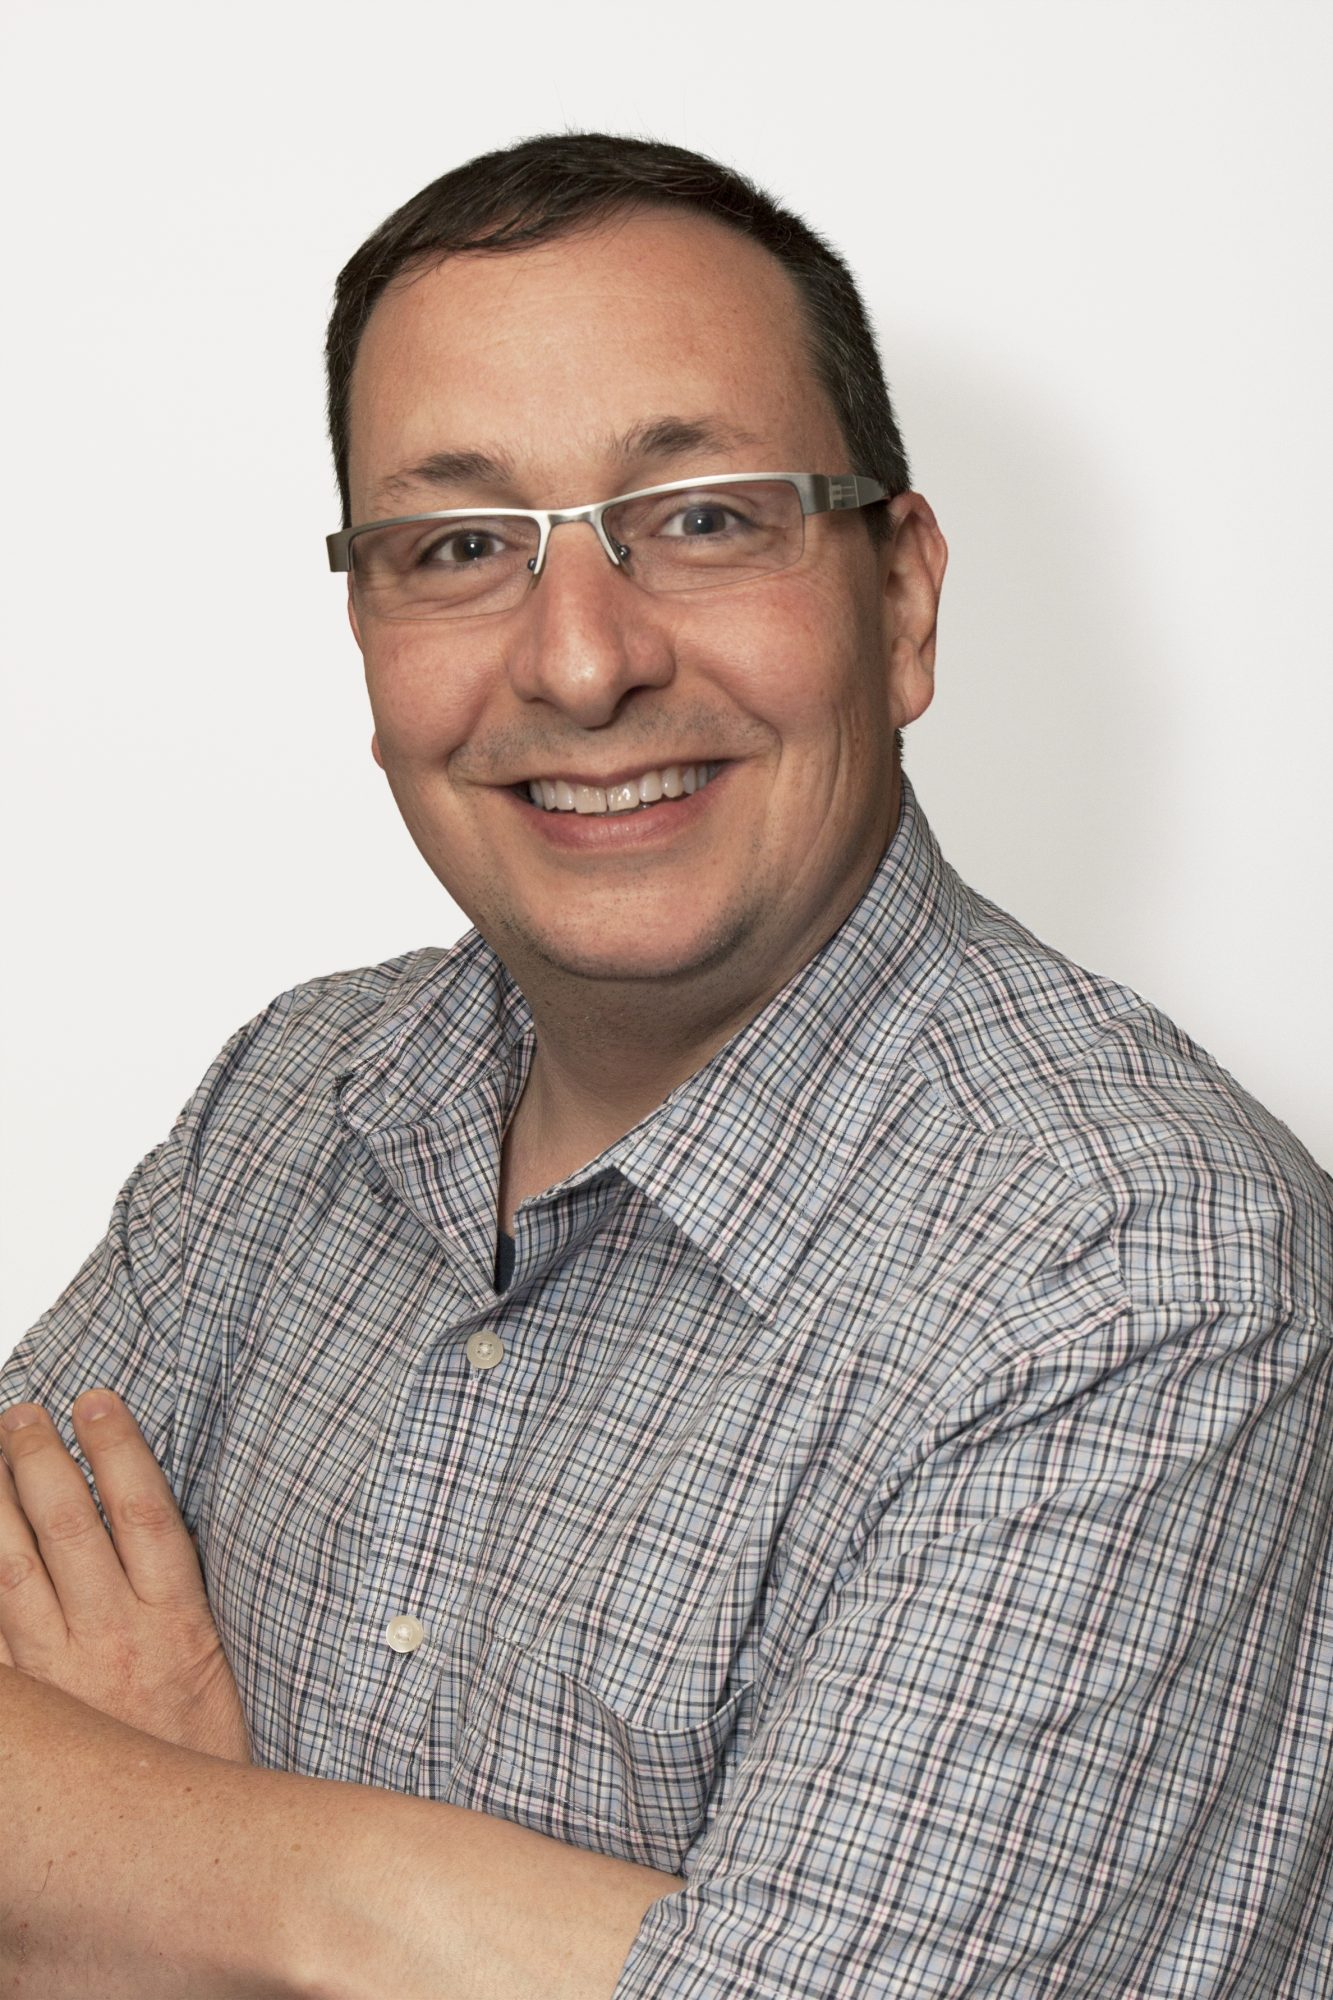 Patrick Tremblay of Cyberimpact.